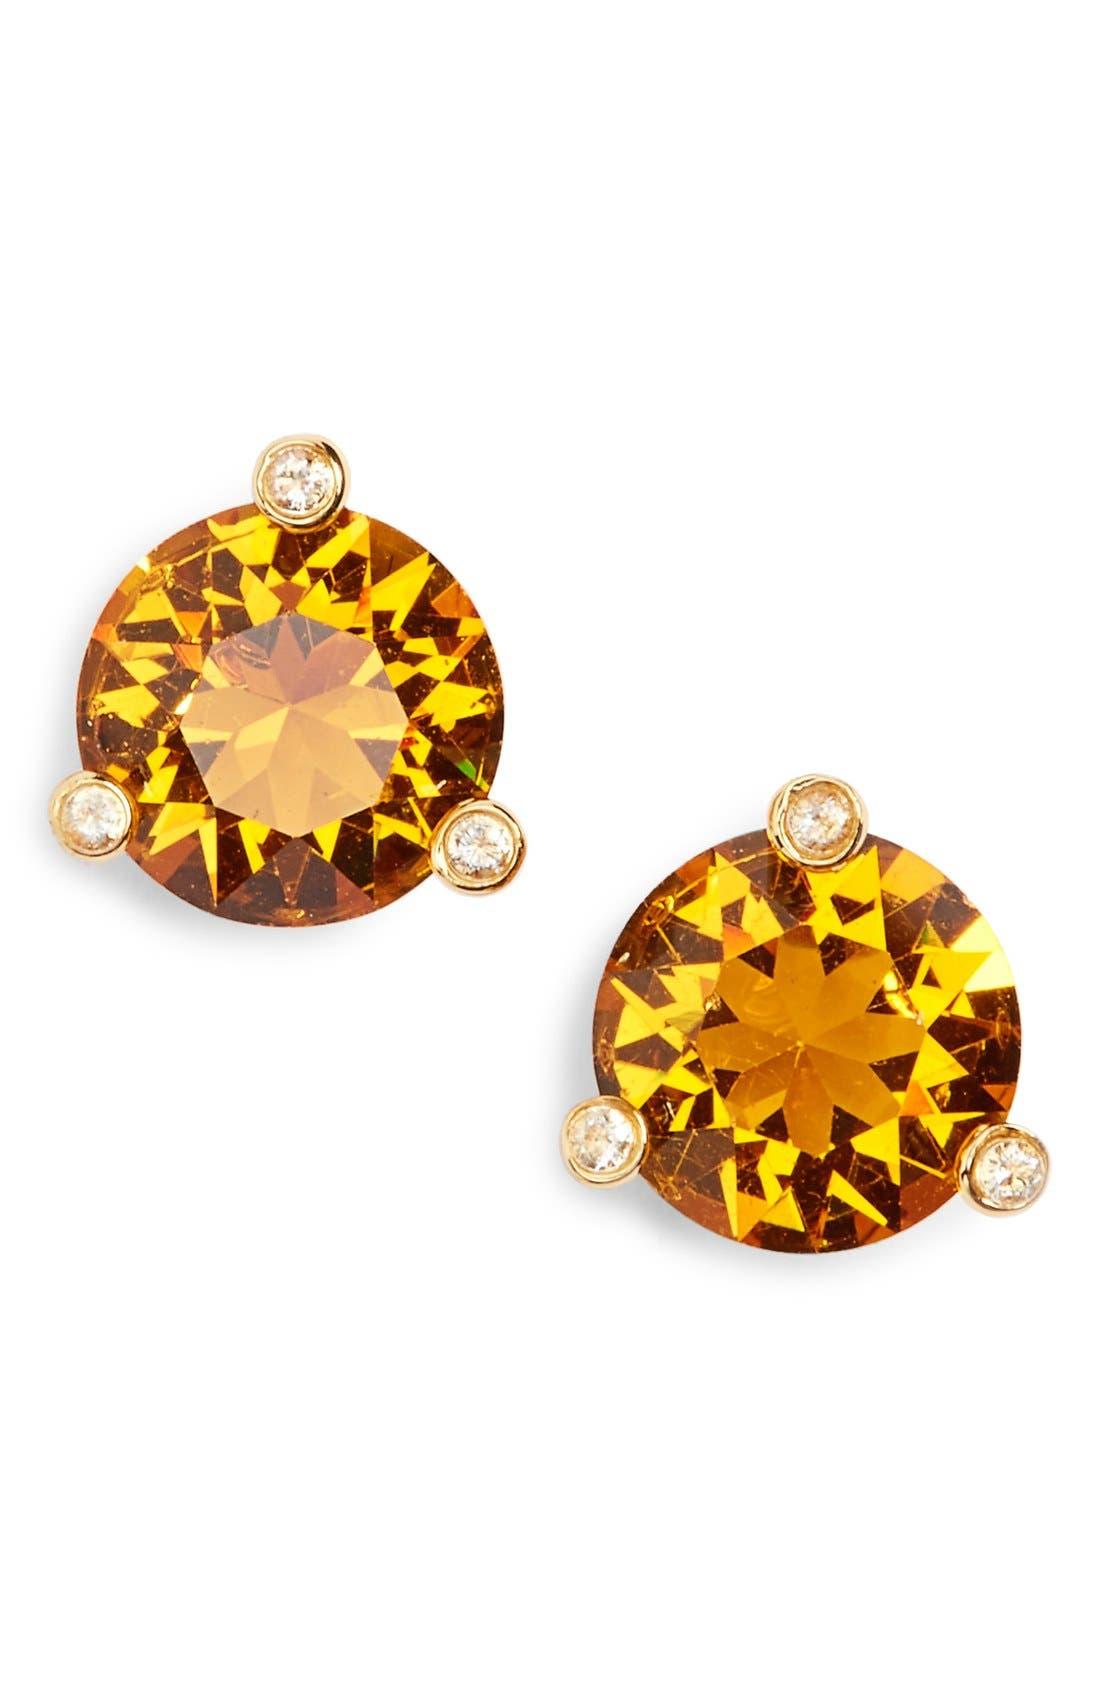 Main Image - kate spade new york 'rise & shine' stud earrings